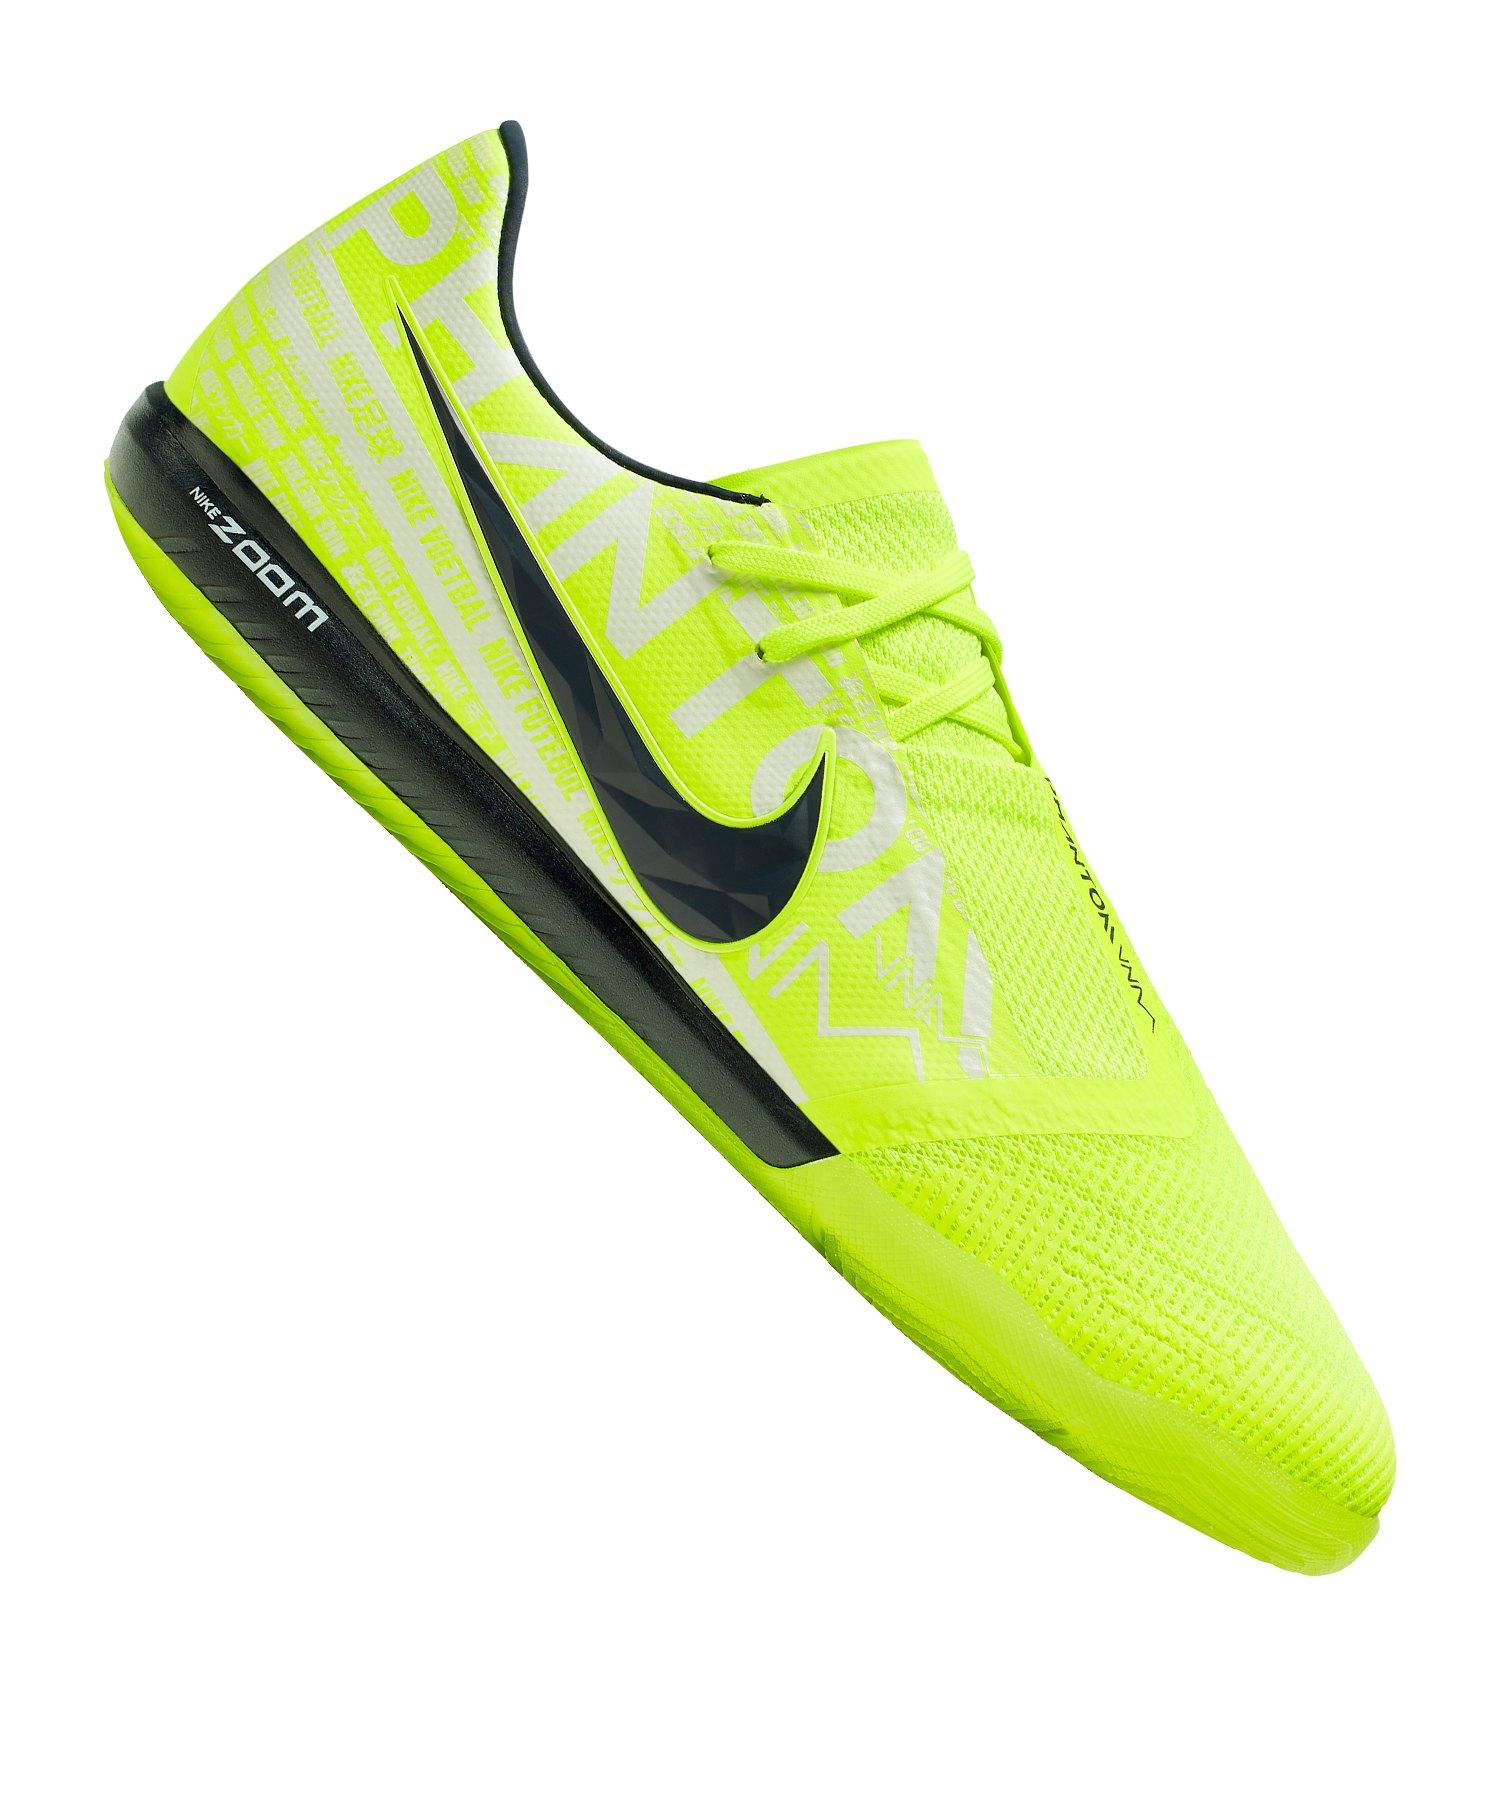 Nike Zoom Phantom Venom Pro IC Gelb Schwarz F717 - gelb